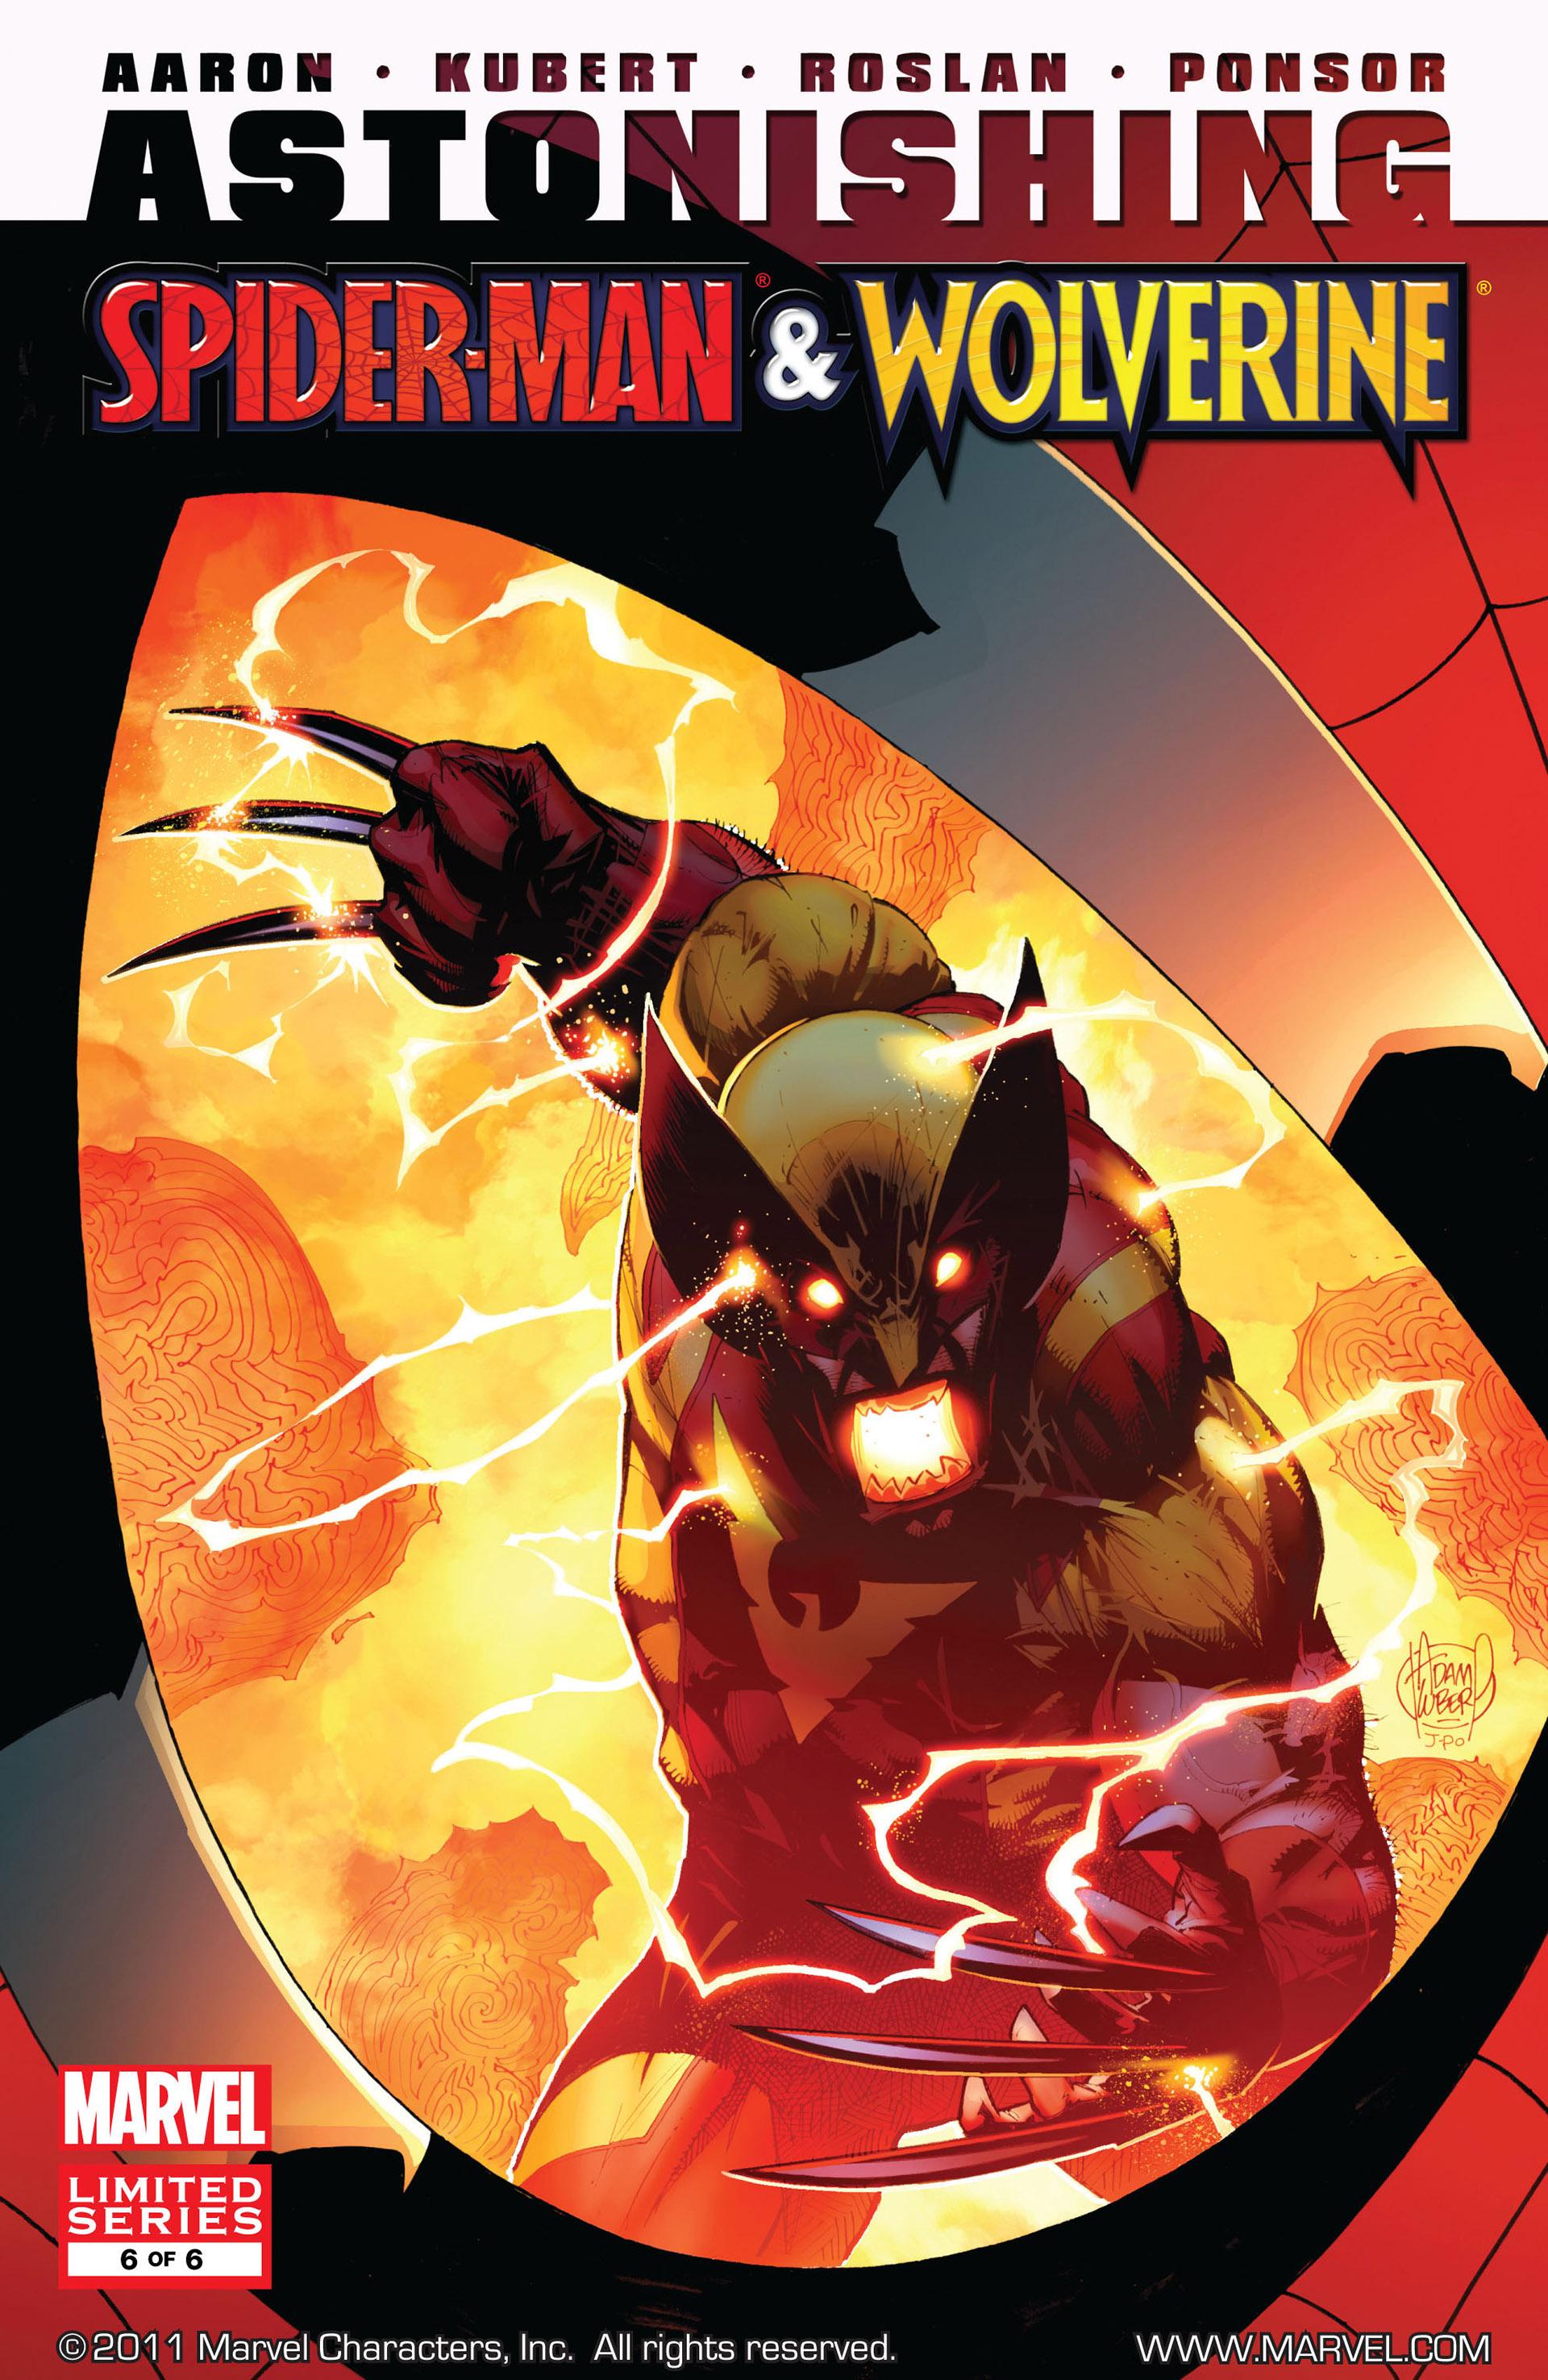 Read online Astonishing Spider-Man & Wolverine comic -  Issue #6 - 1